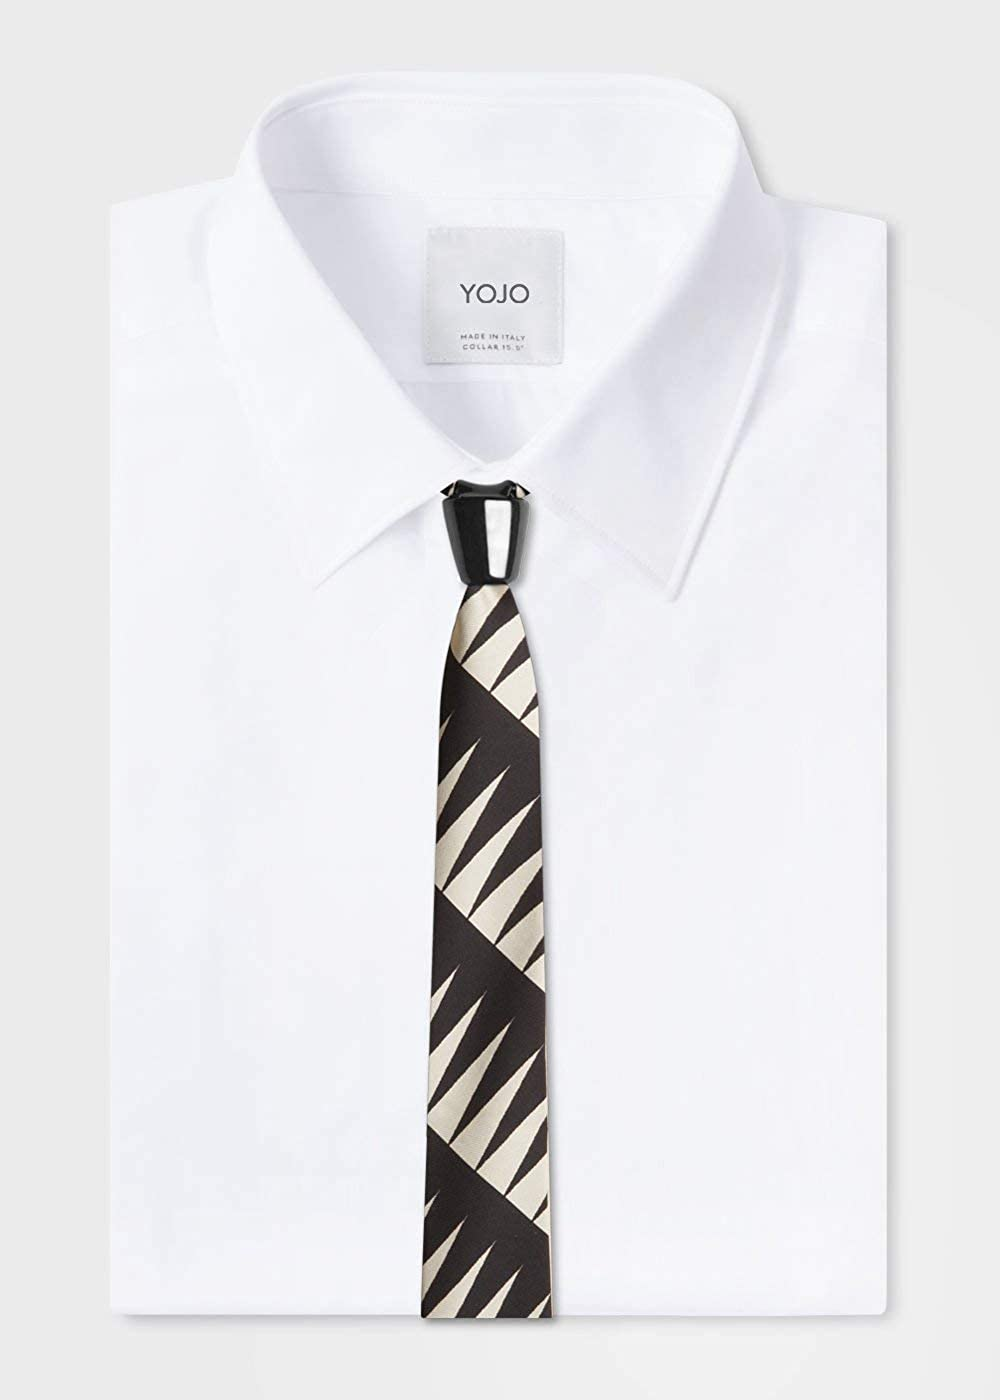 YOJO LIMITED Cravatta uomo in seta con nodo windsor in ceramica